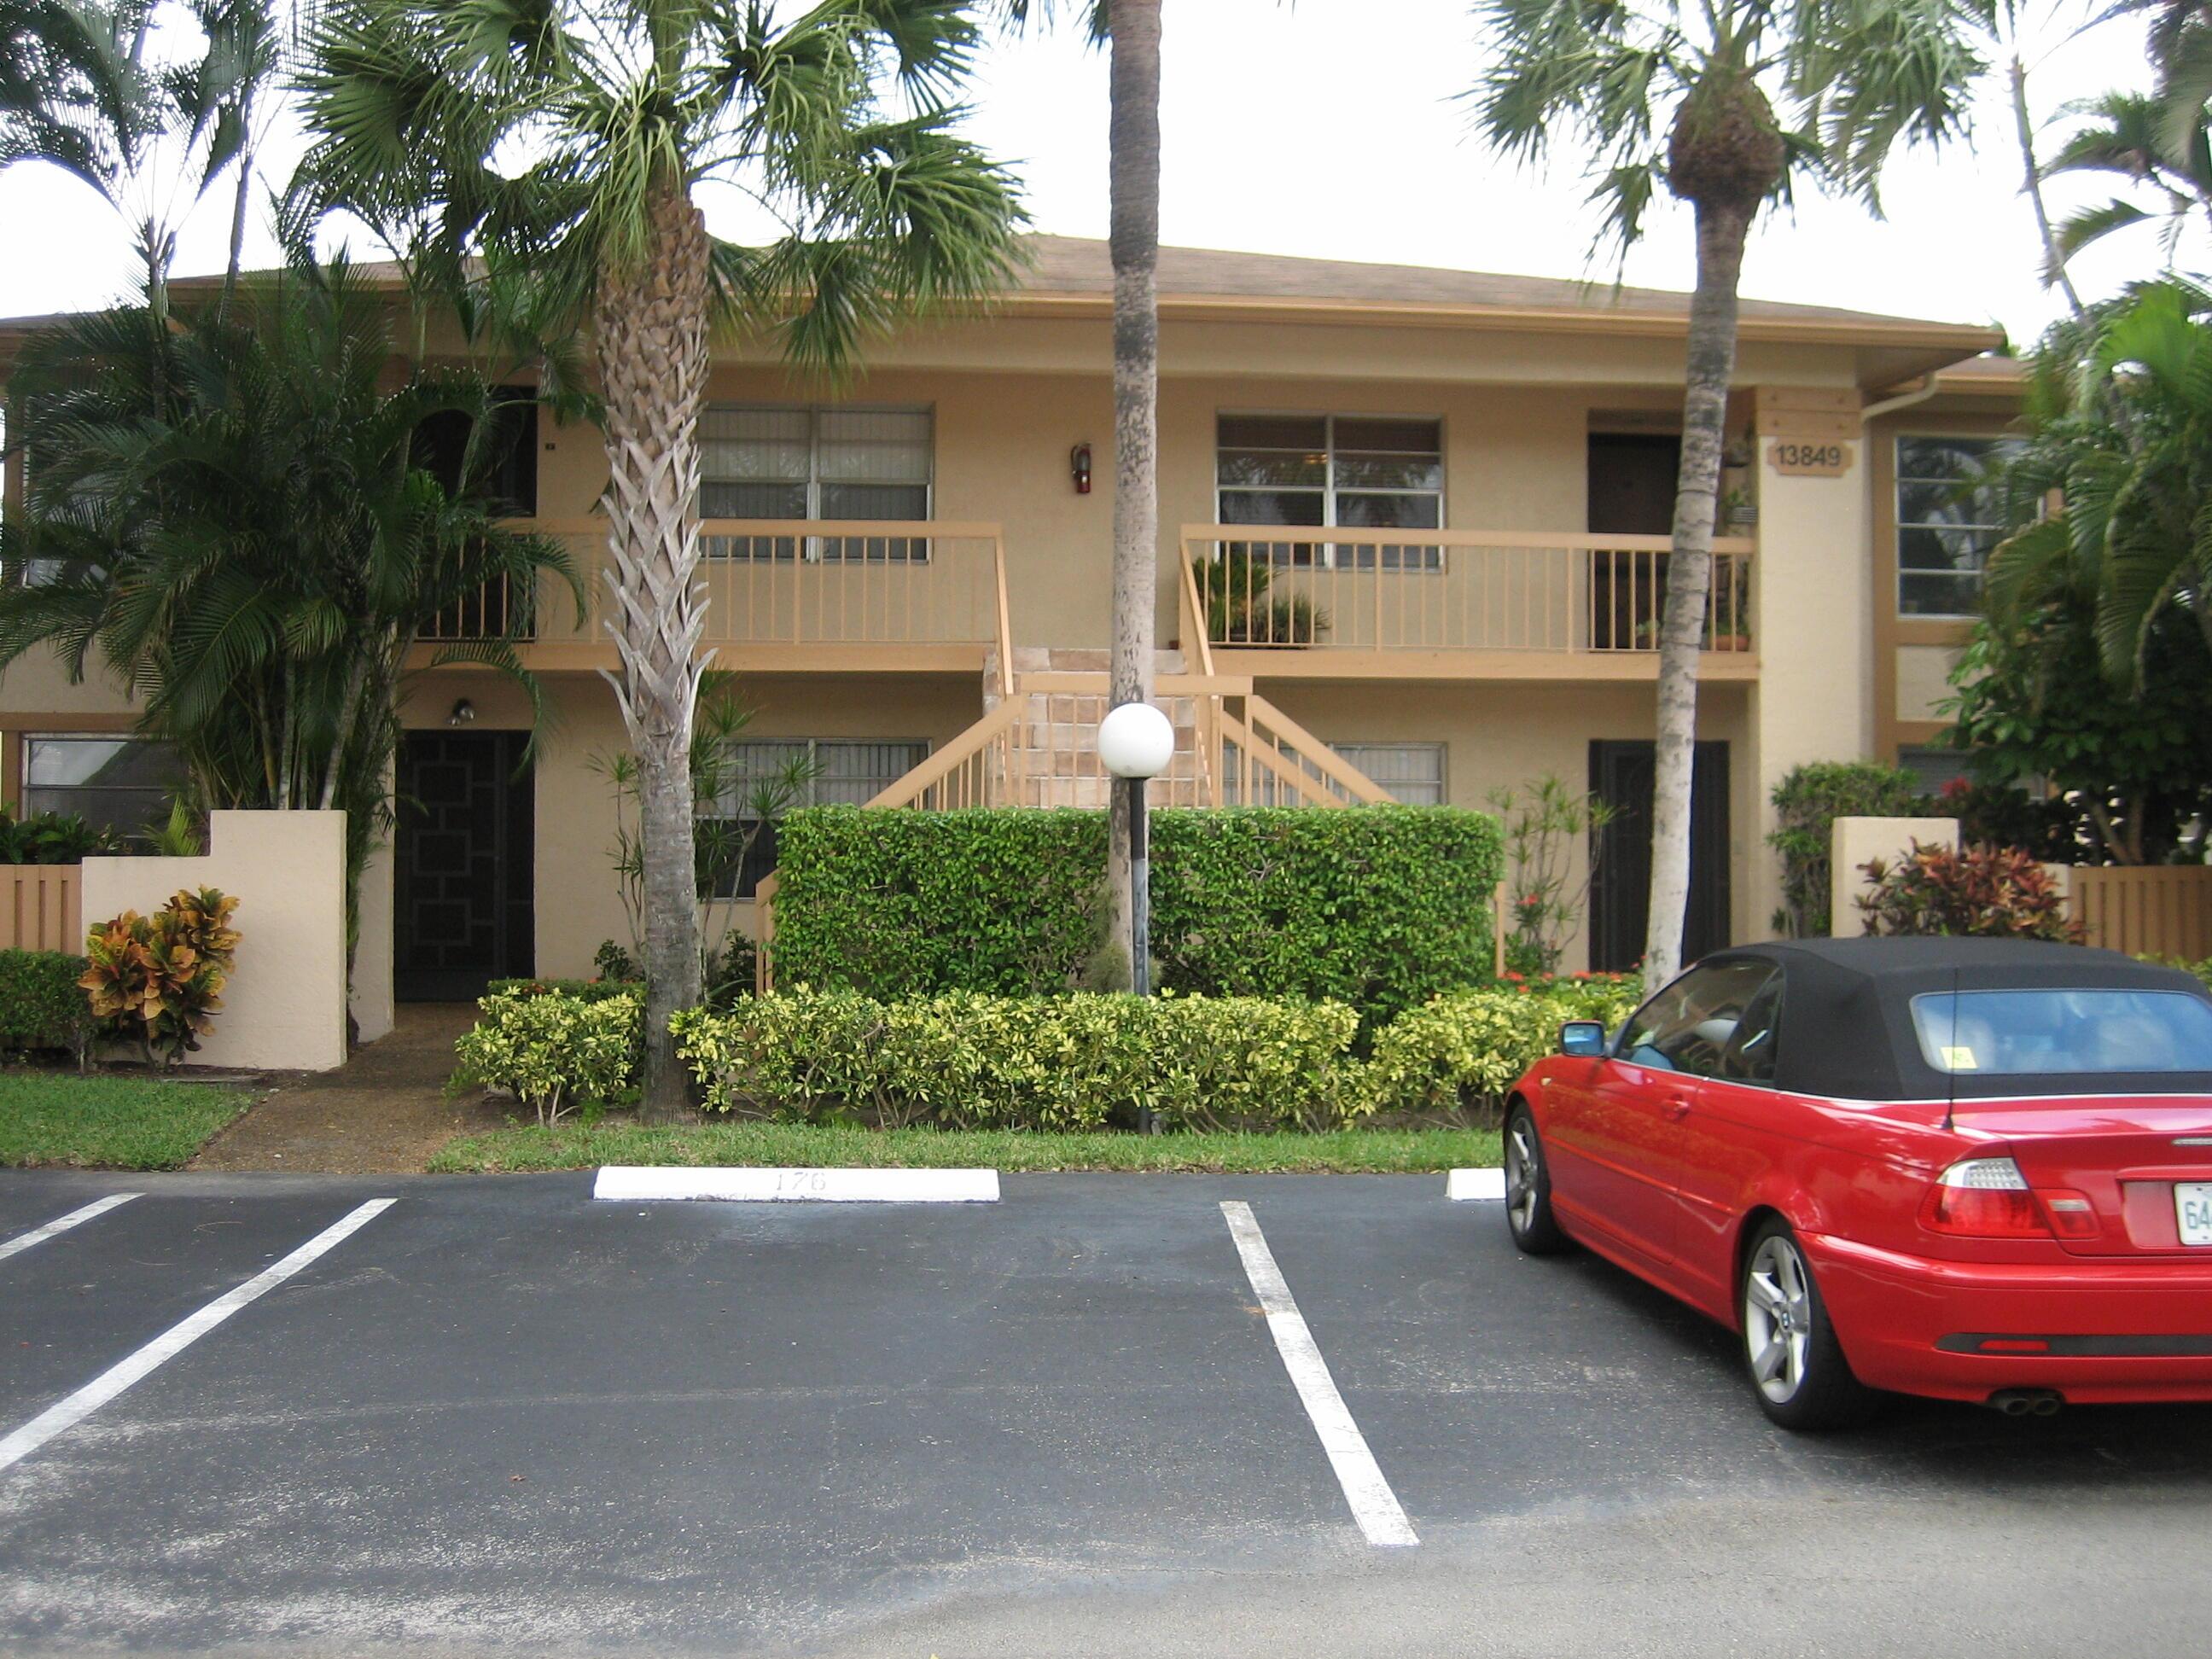 13849 Royal Palm Court, Delray Beach, FL 33484